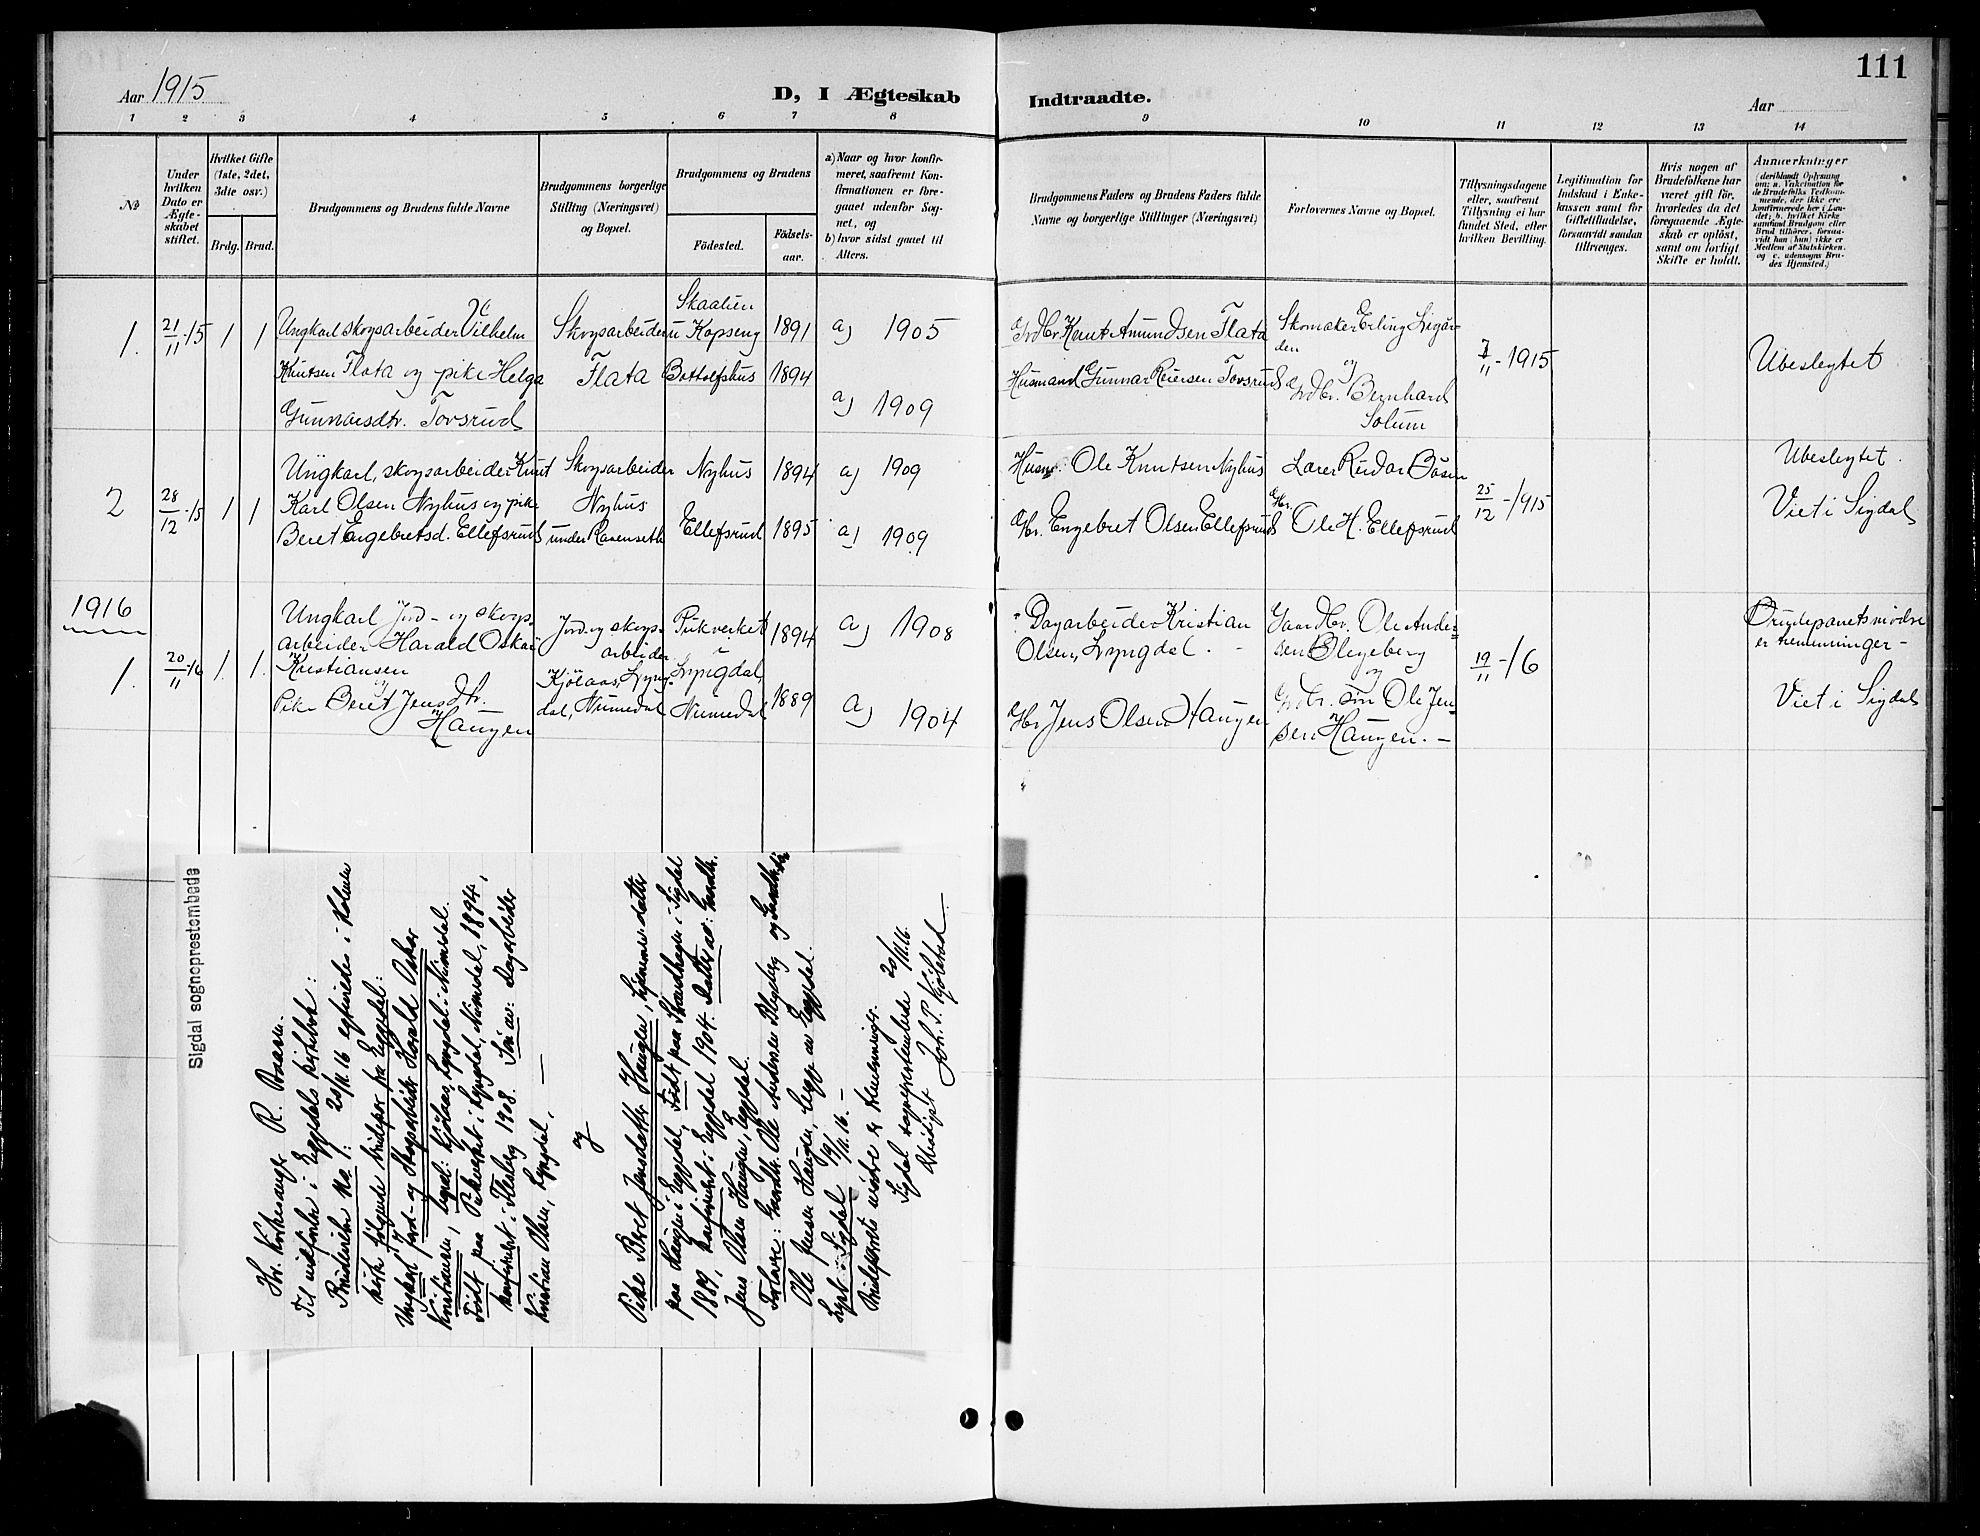 SAKO, Sigdal kirkebøker, G/Gb/L0003: Klokkerbok nr. II 3, 1901-1916, s. 111